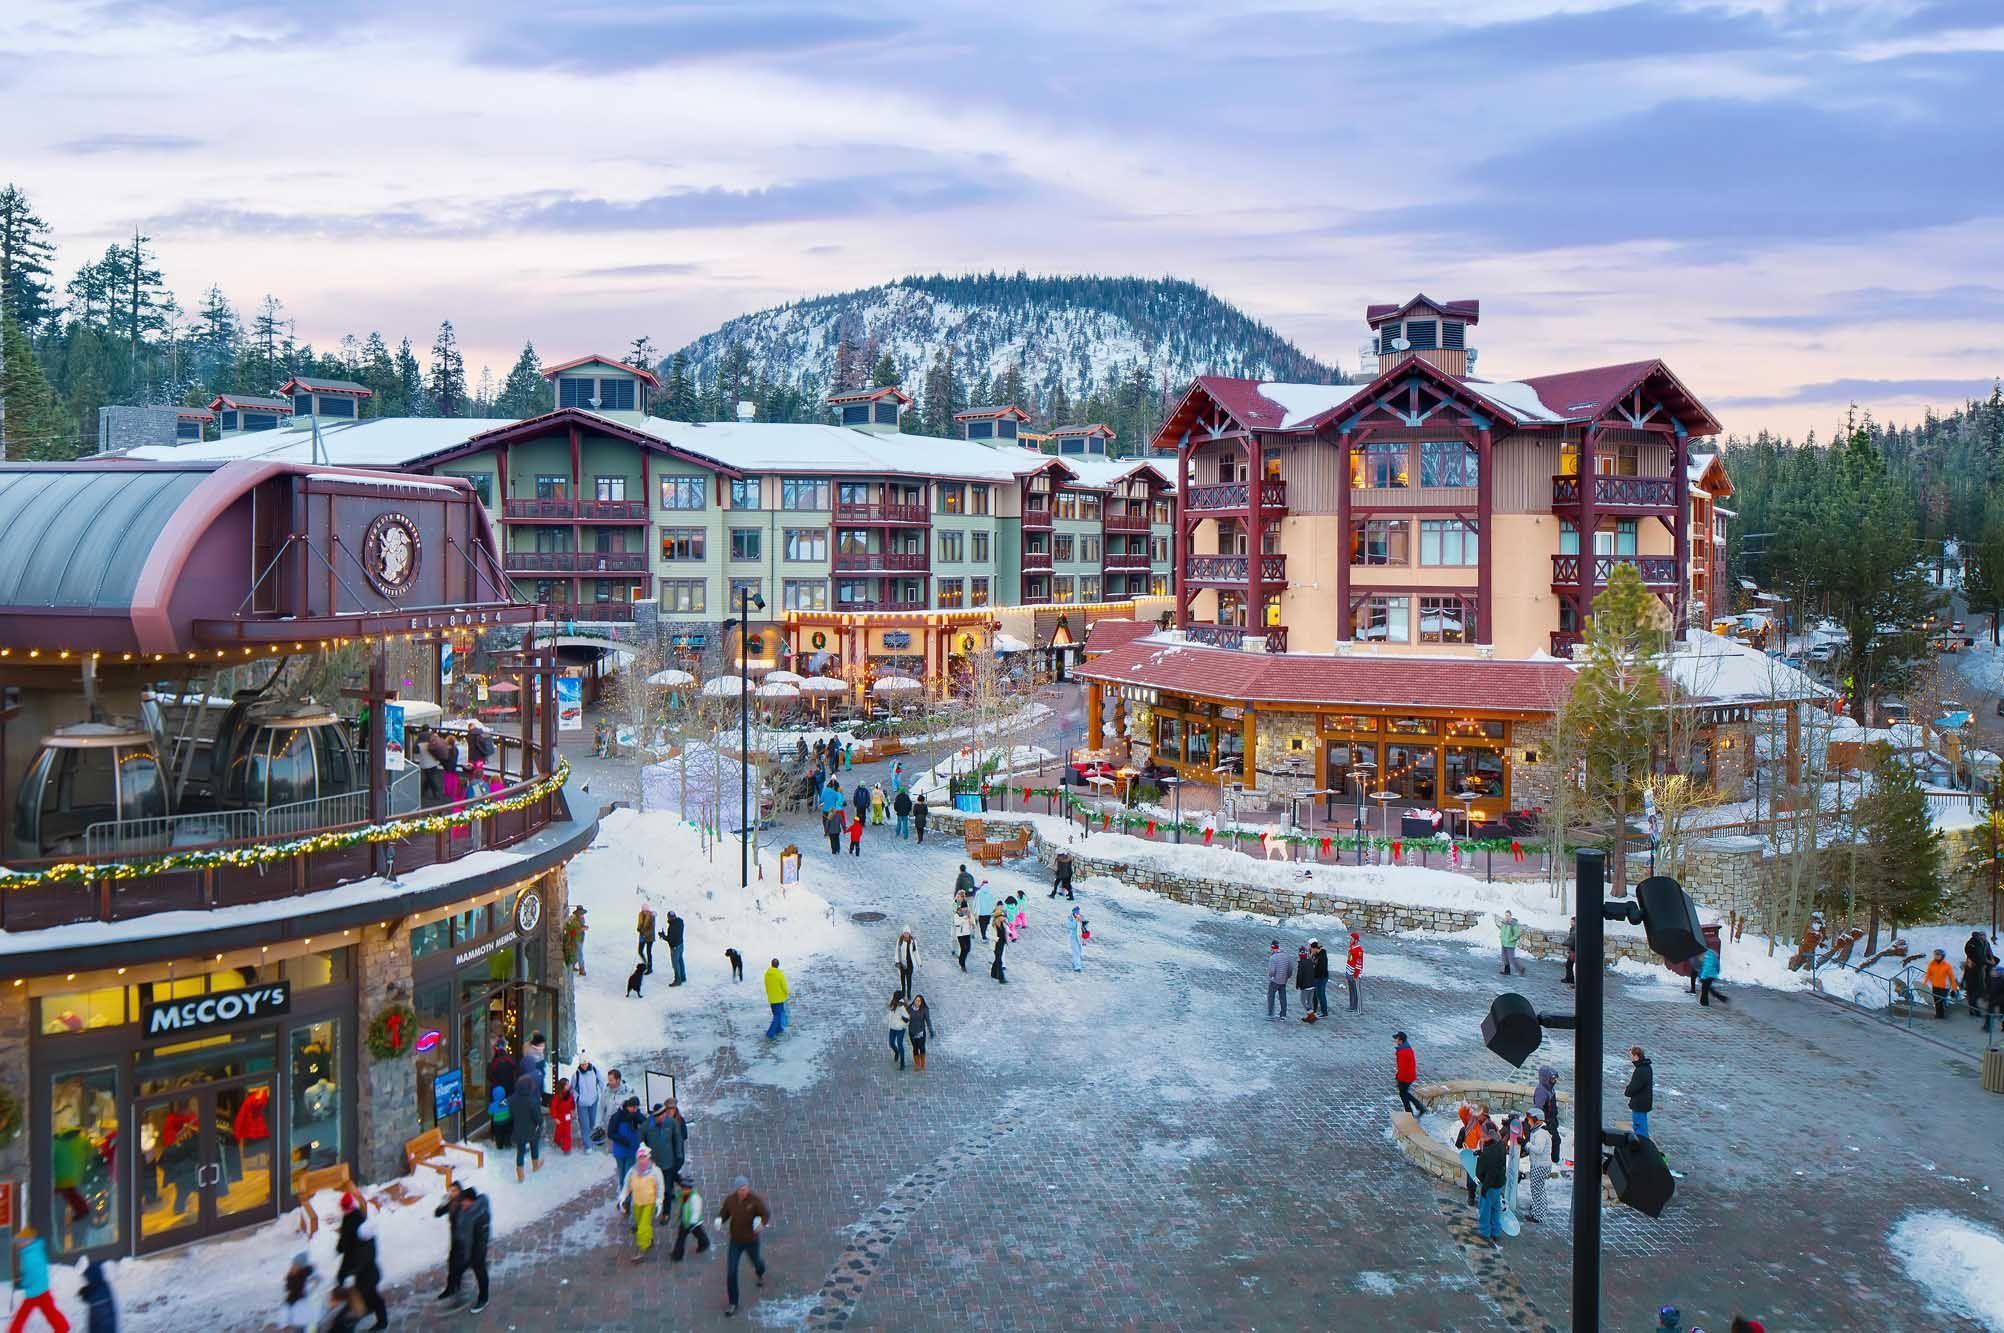 10 best winter vacations ideas 2018 - fun cold winter getaways